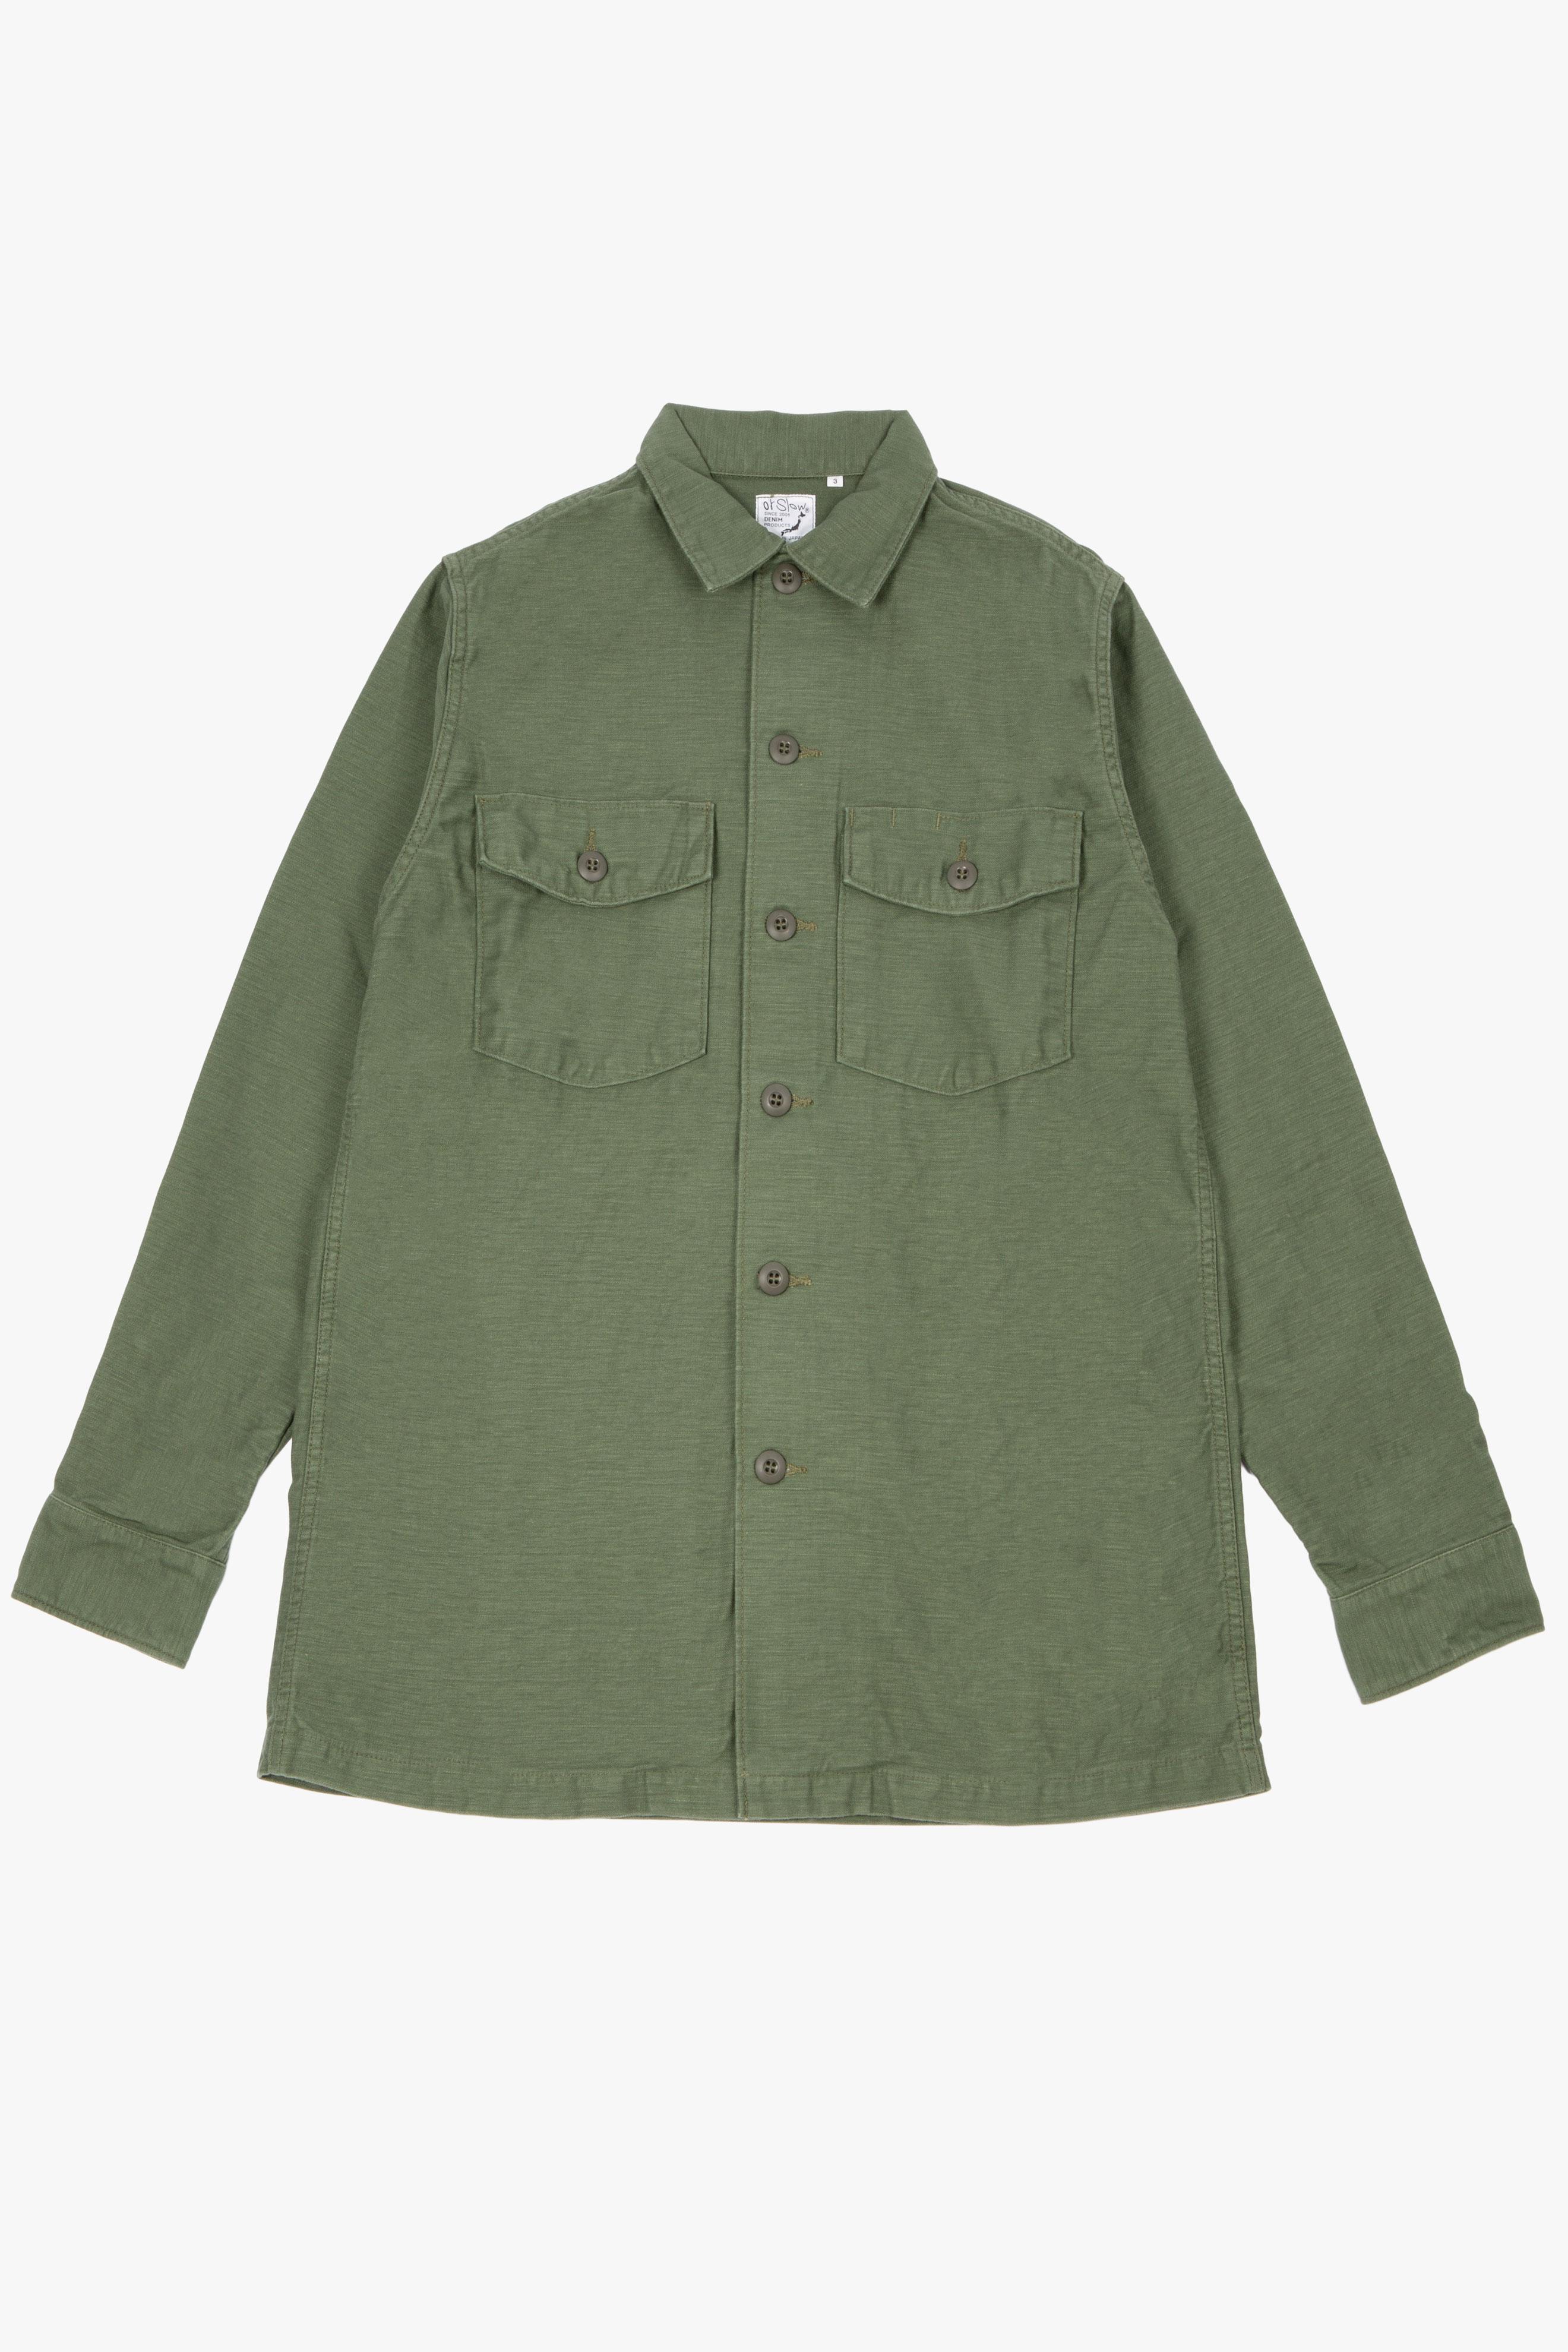 US Army Shirt Green